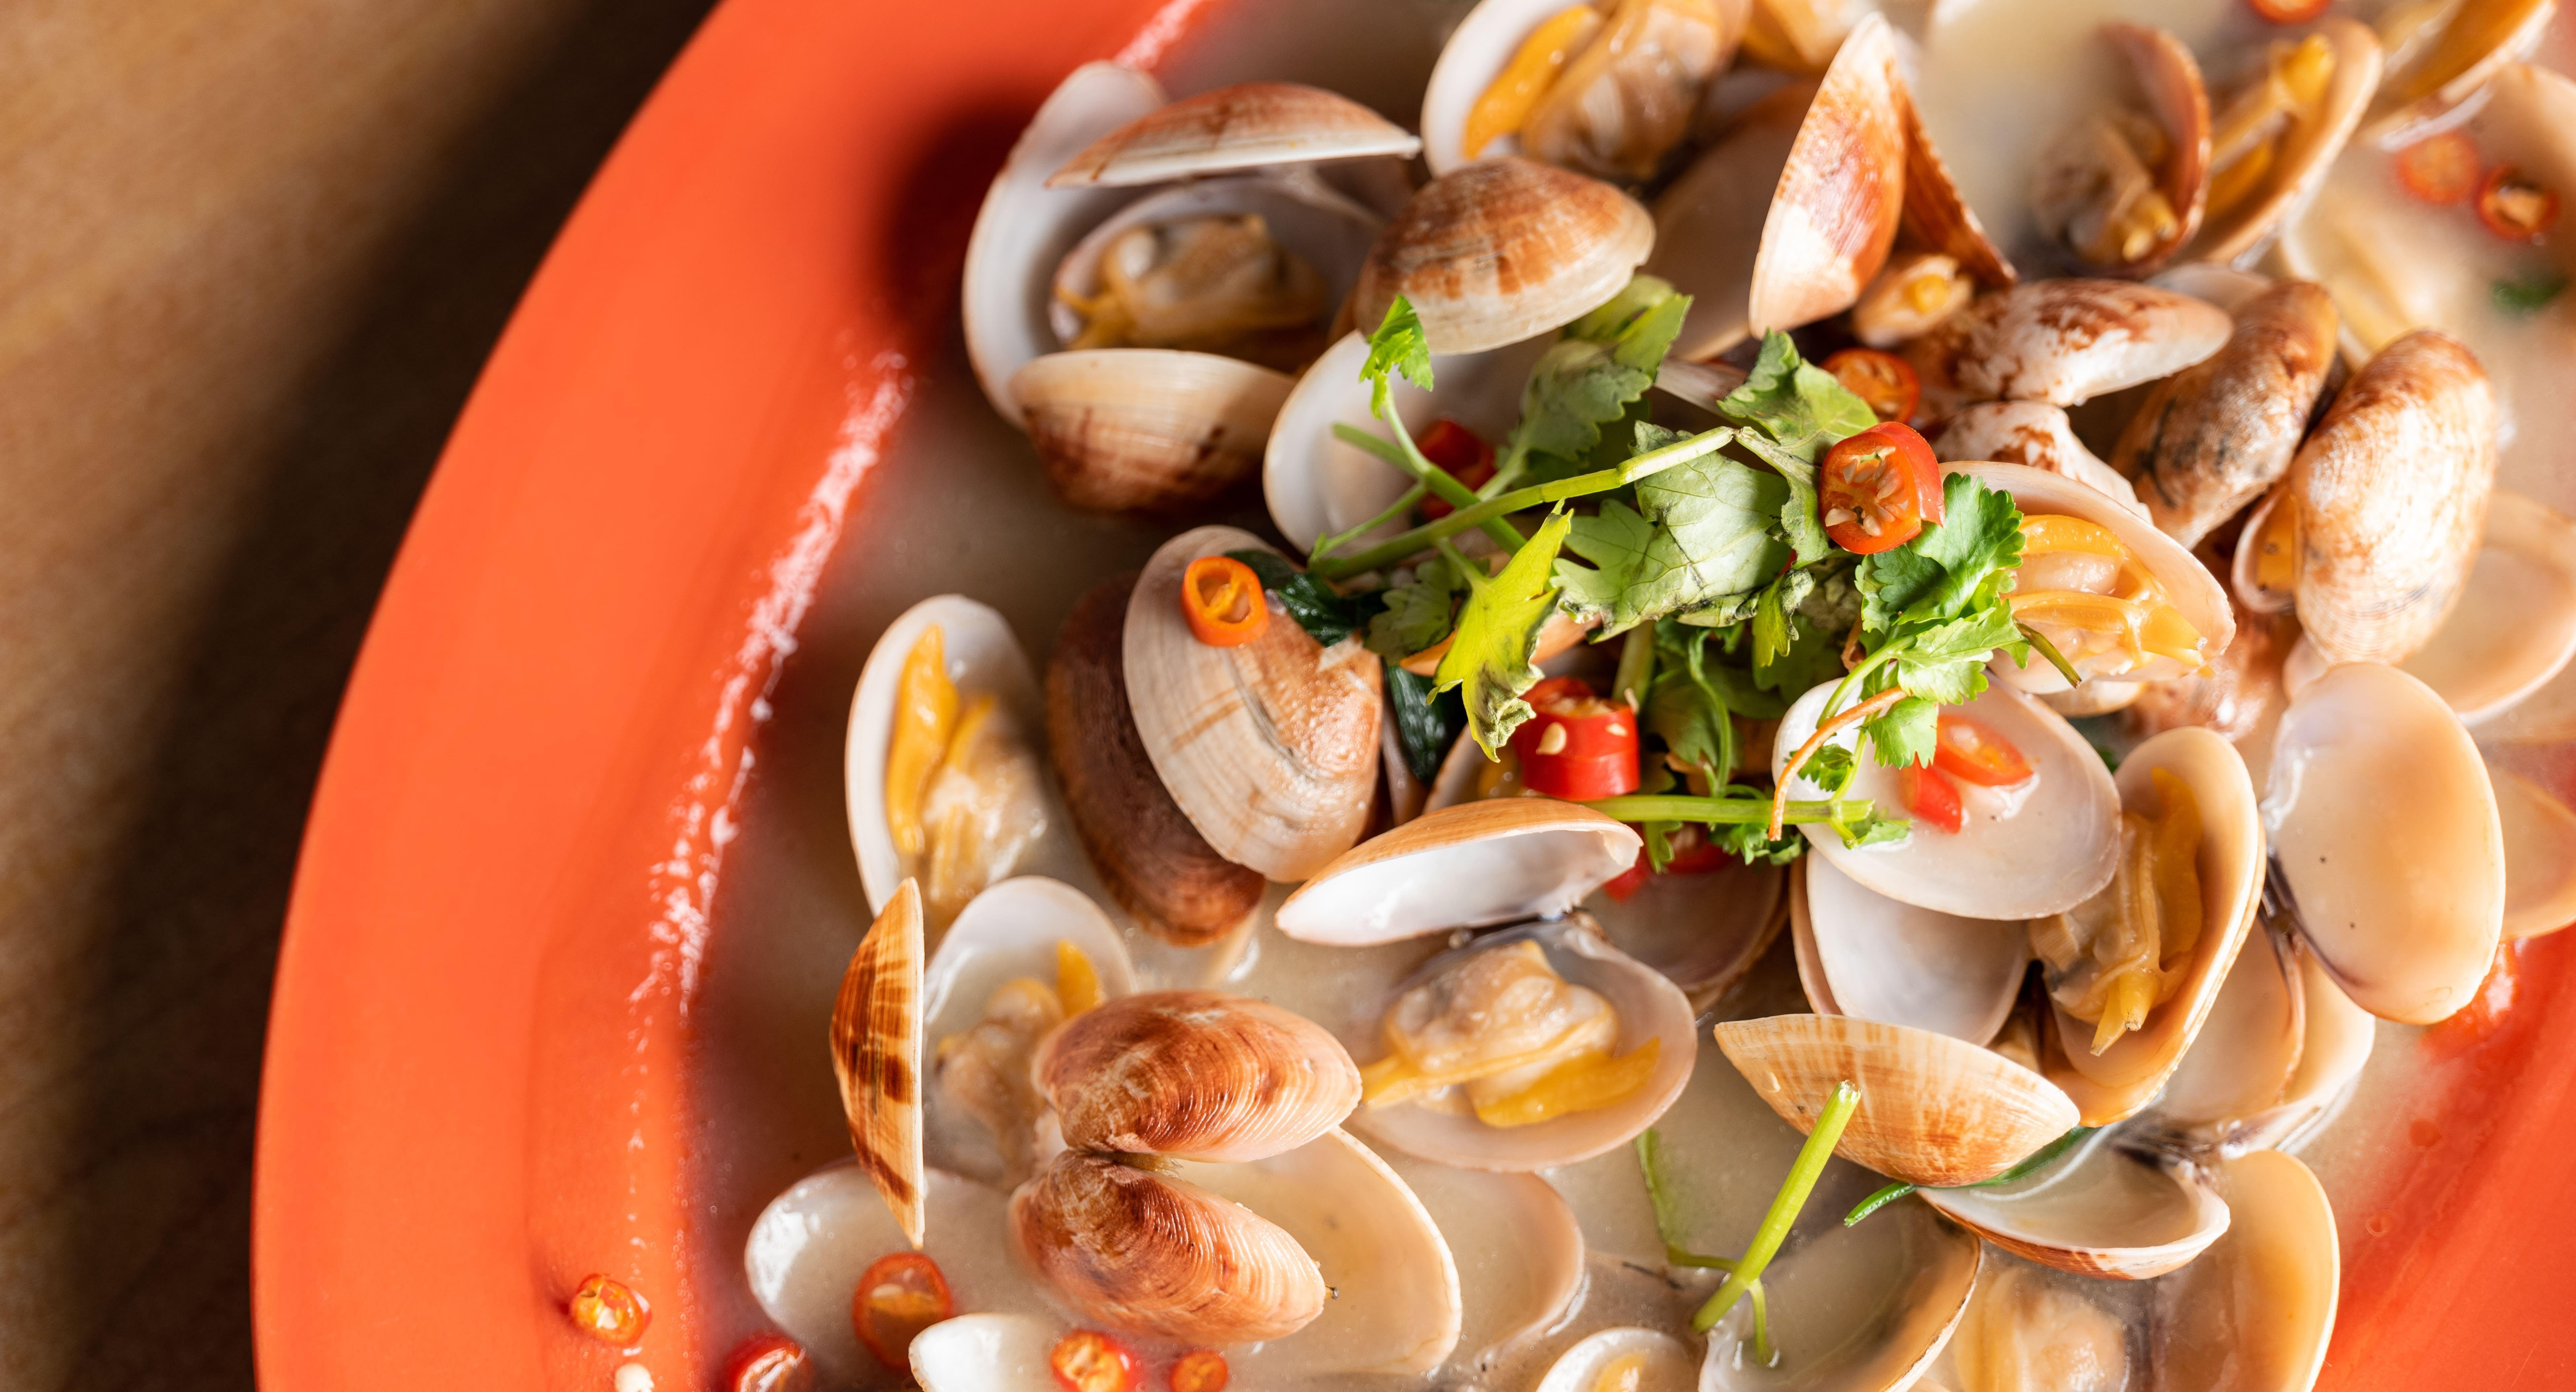 Ban Leong Wah Hoe Seafood Singapore image 2